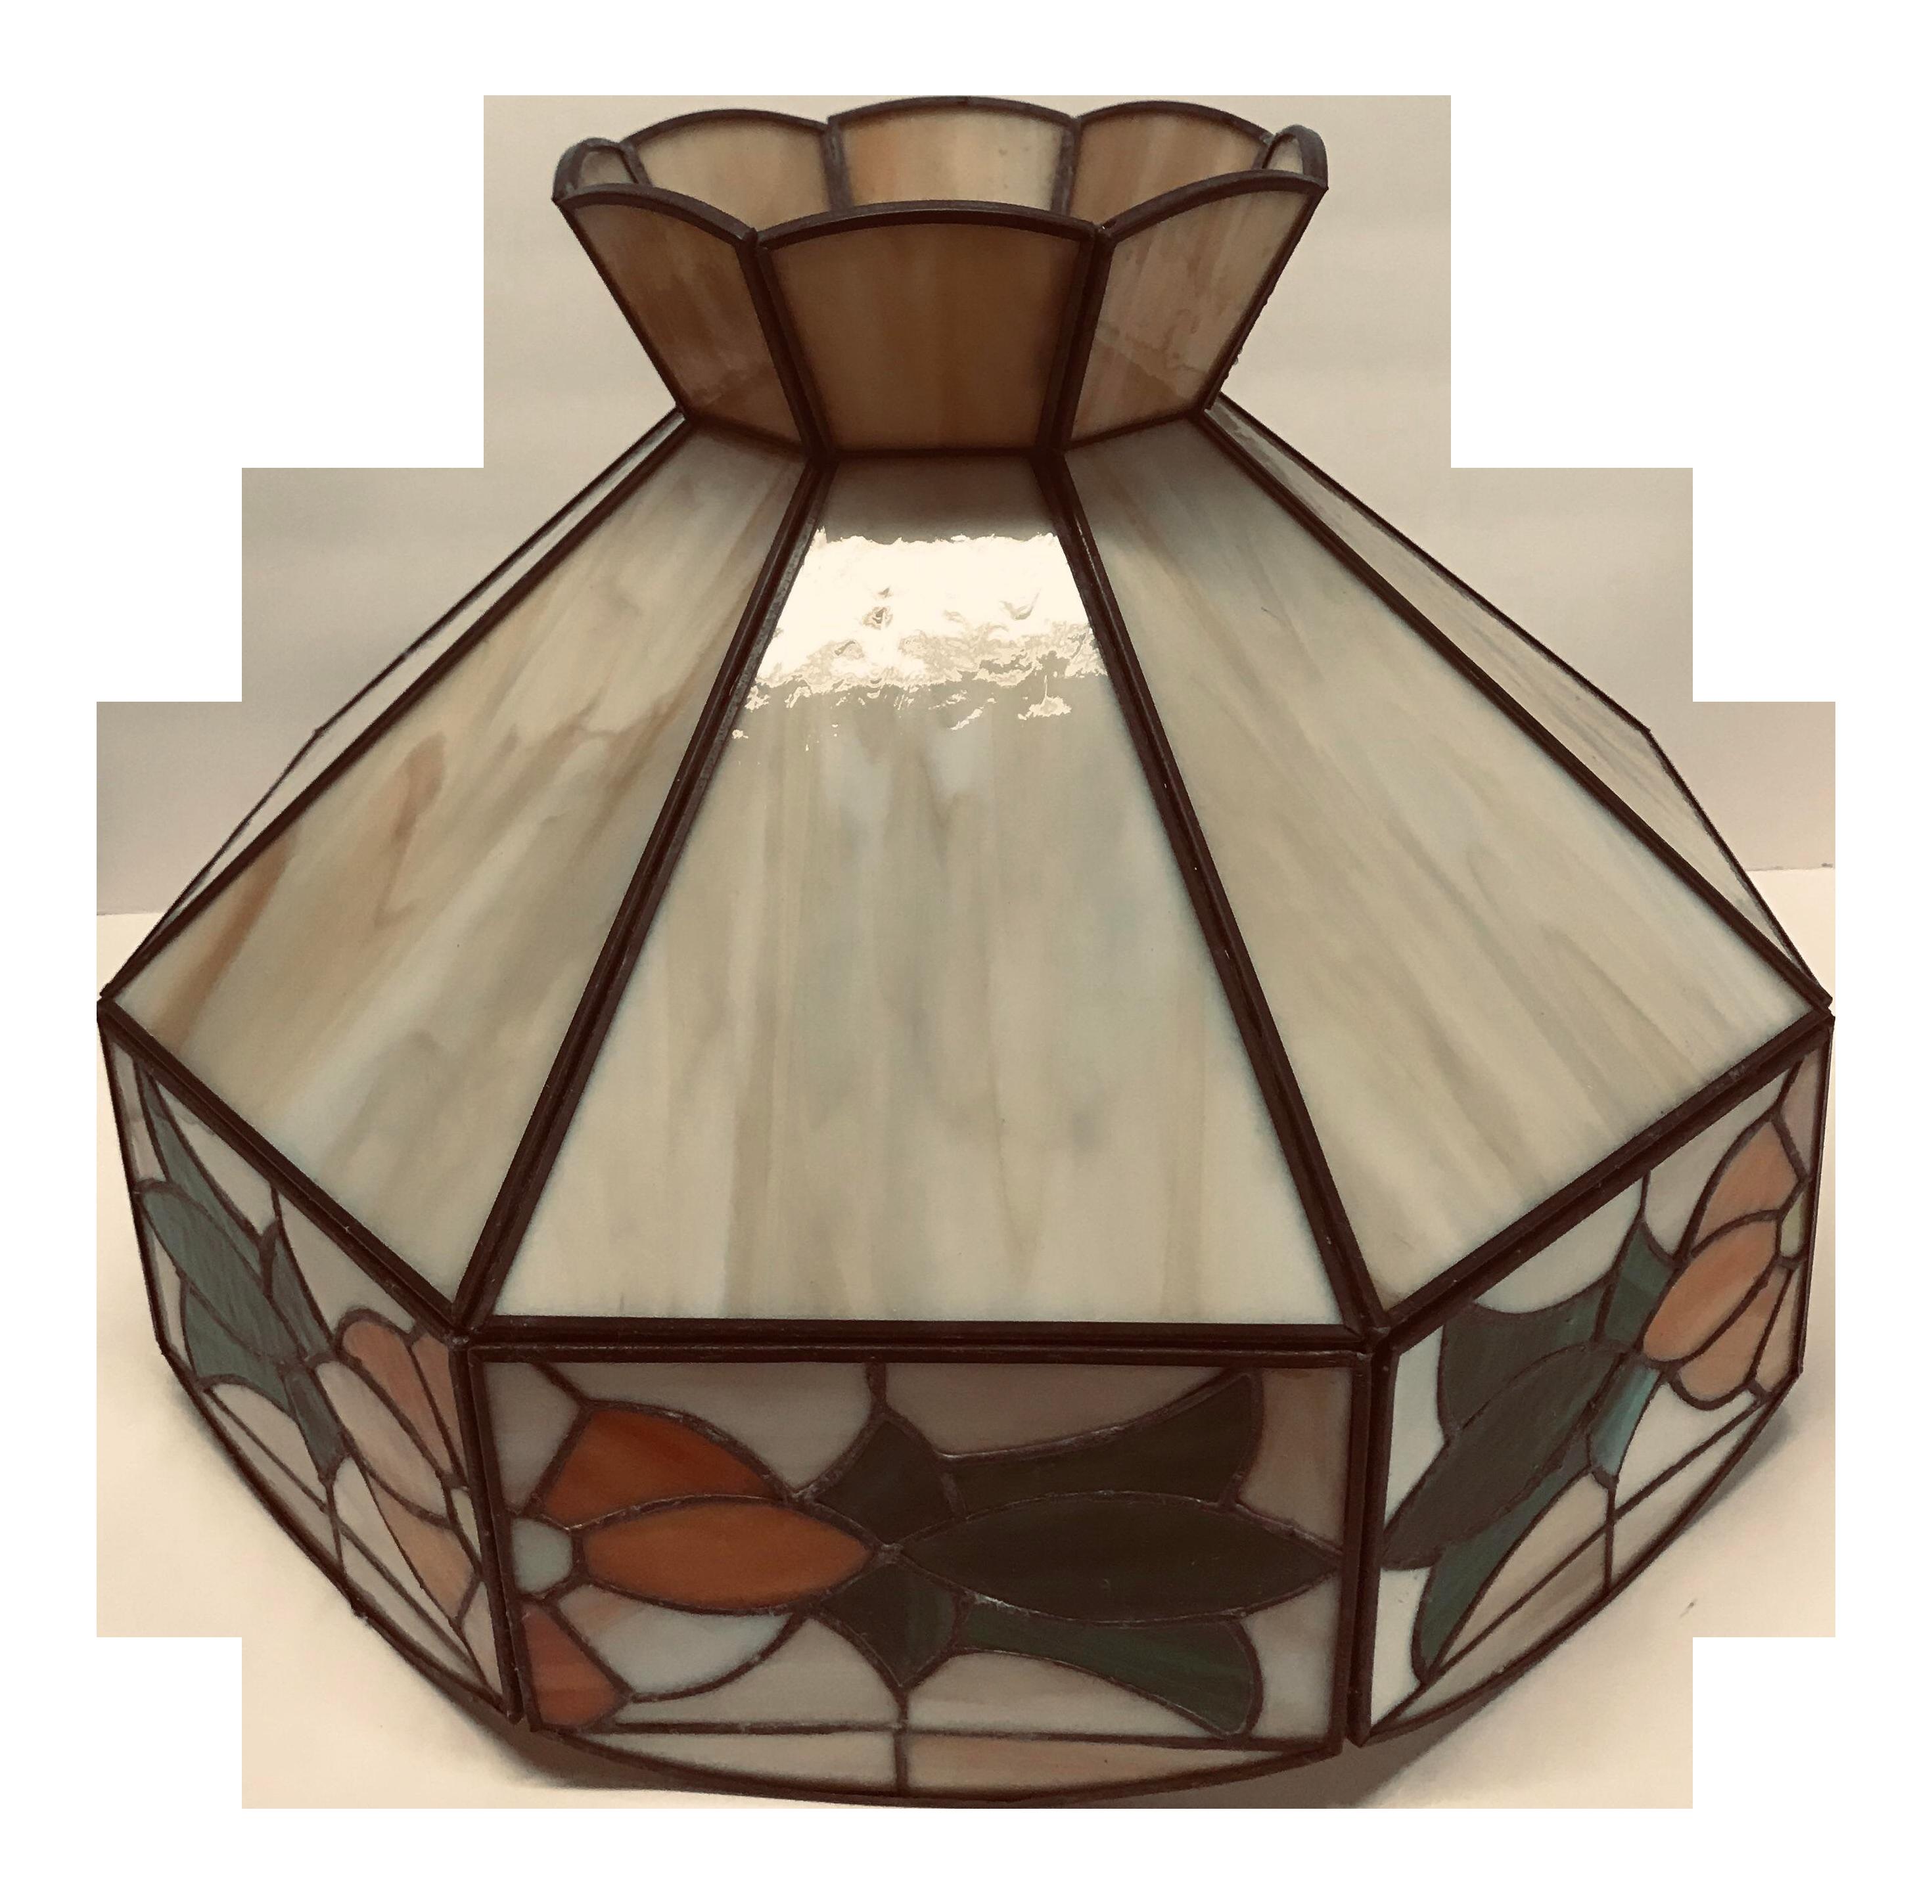 Vintage tiffany style hanging lamp shade